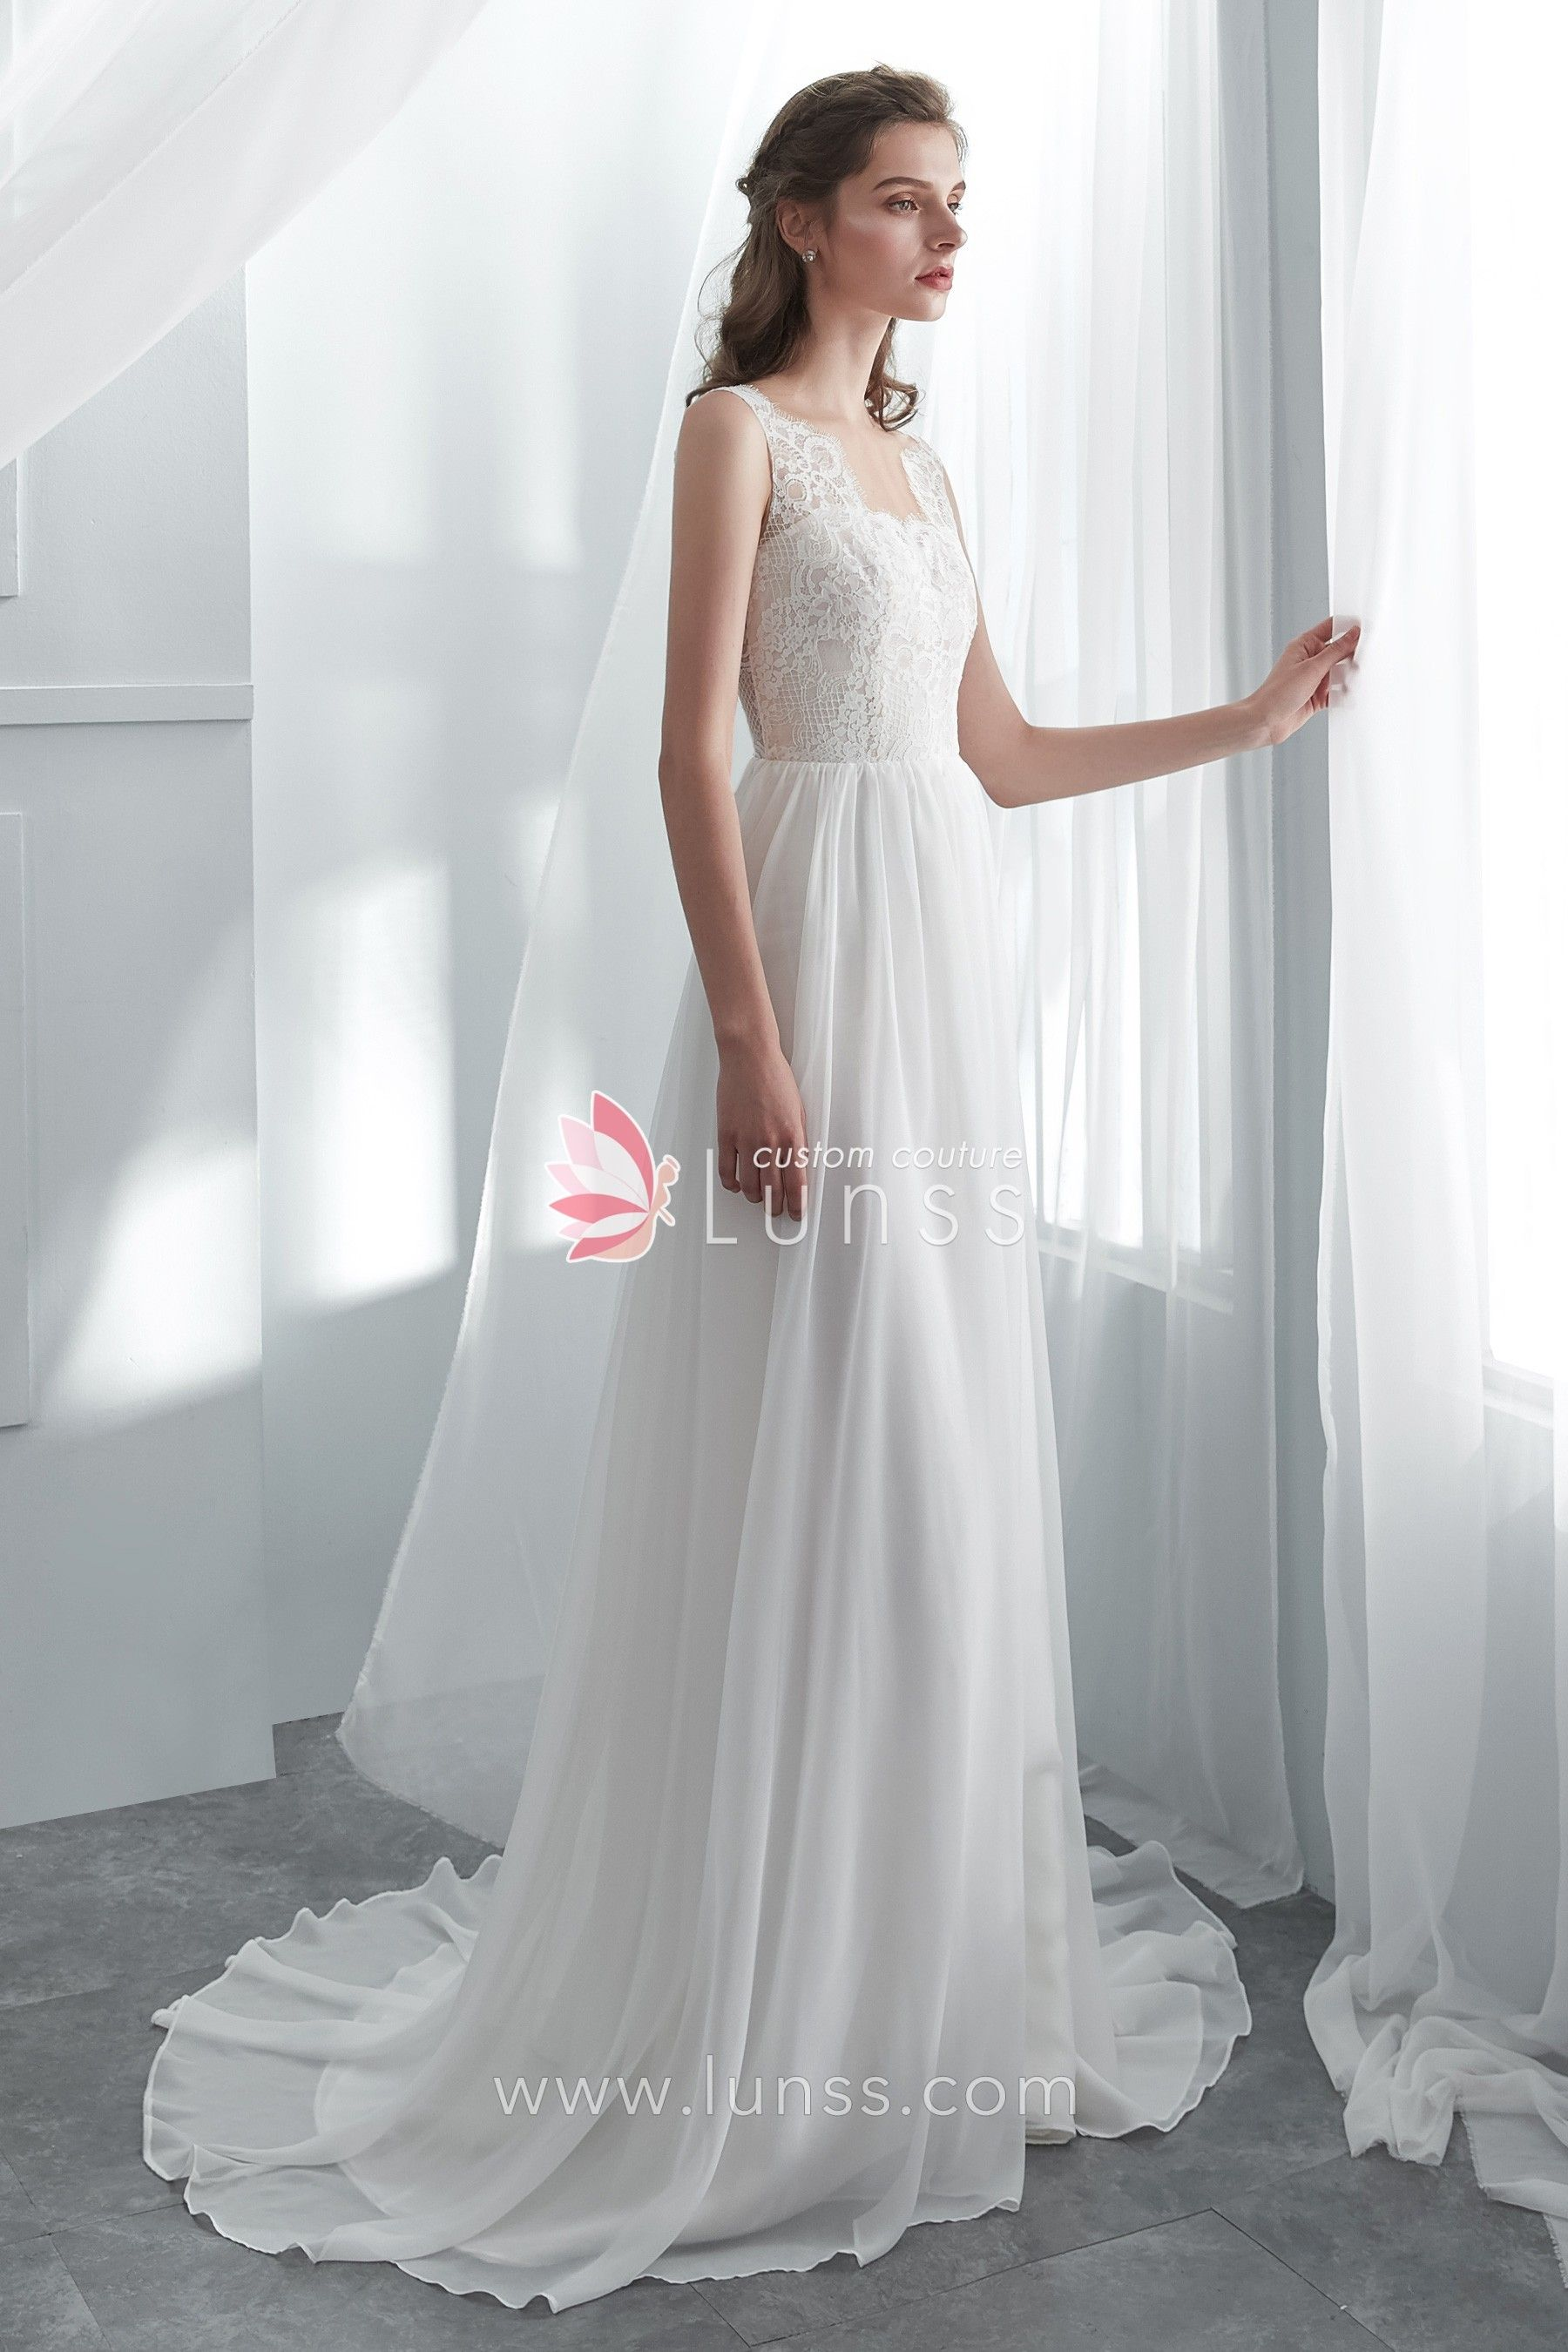 cdc6361865 High Quality Soft Ivory Scallop Neckline Lace Chiffon Flowing A line Beach  Wedding Dress